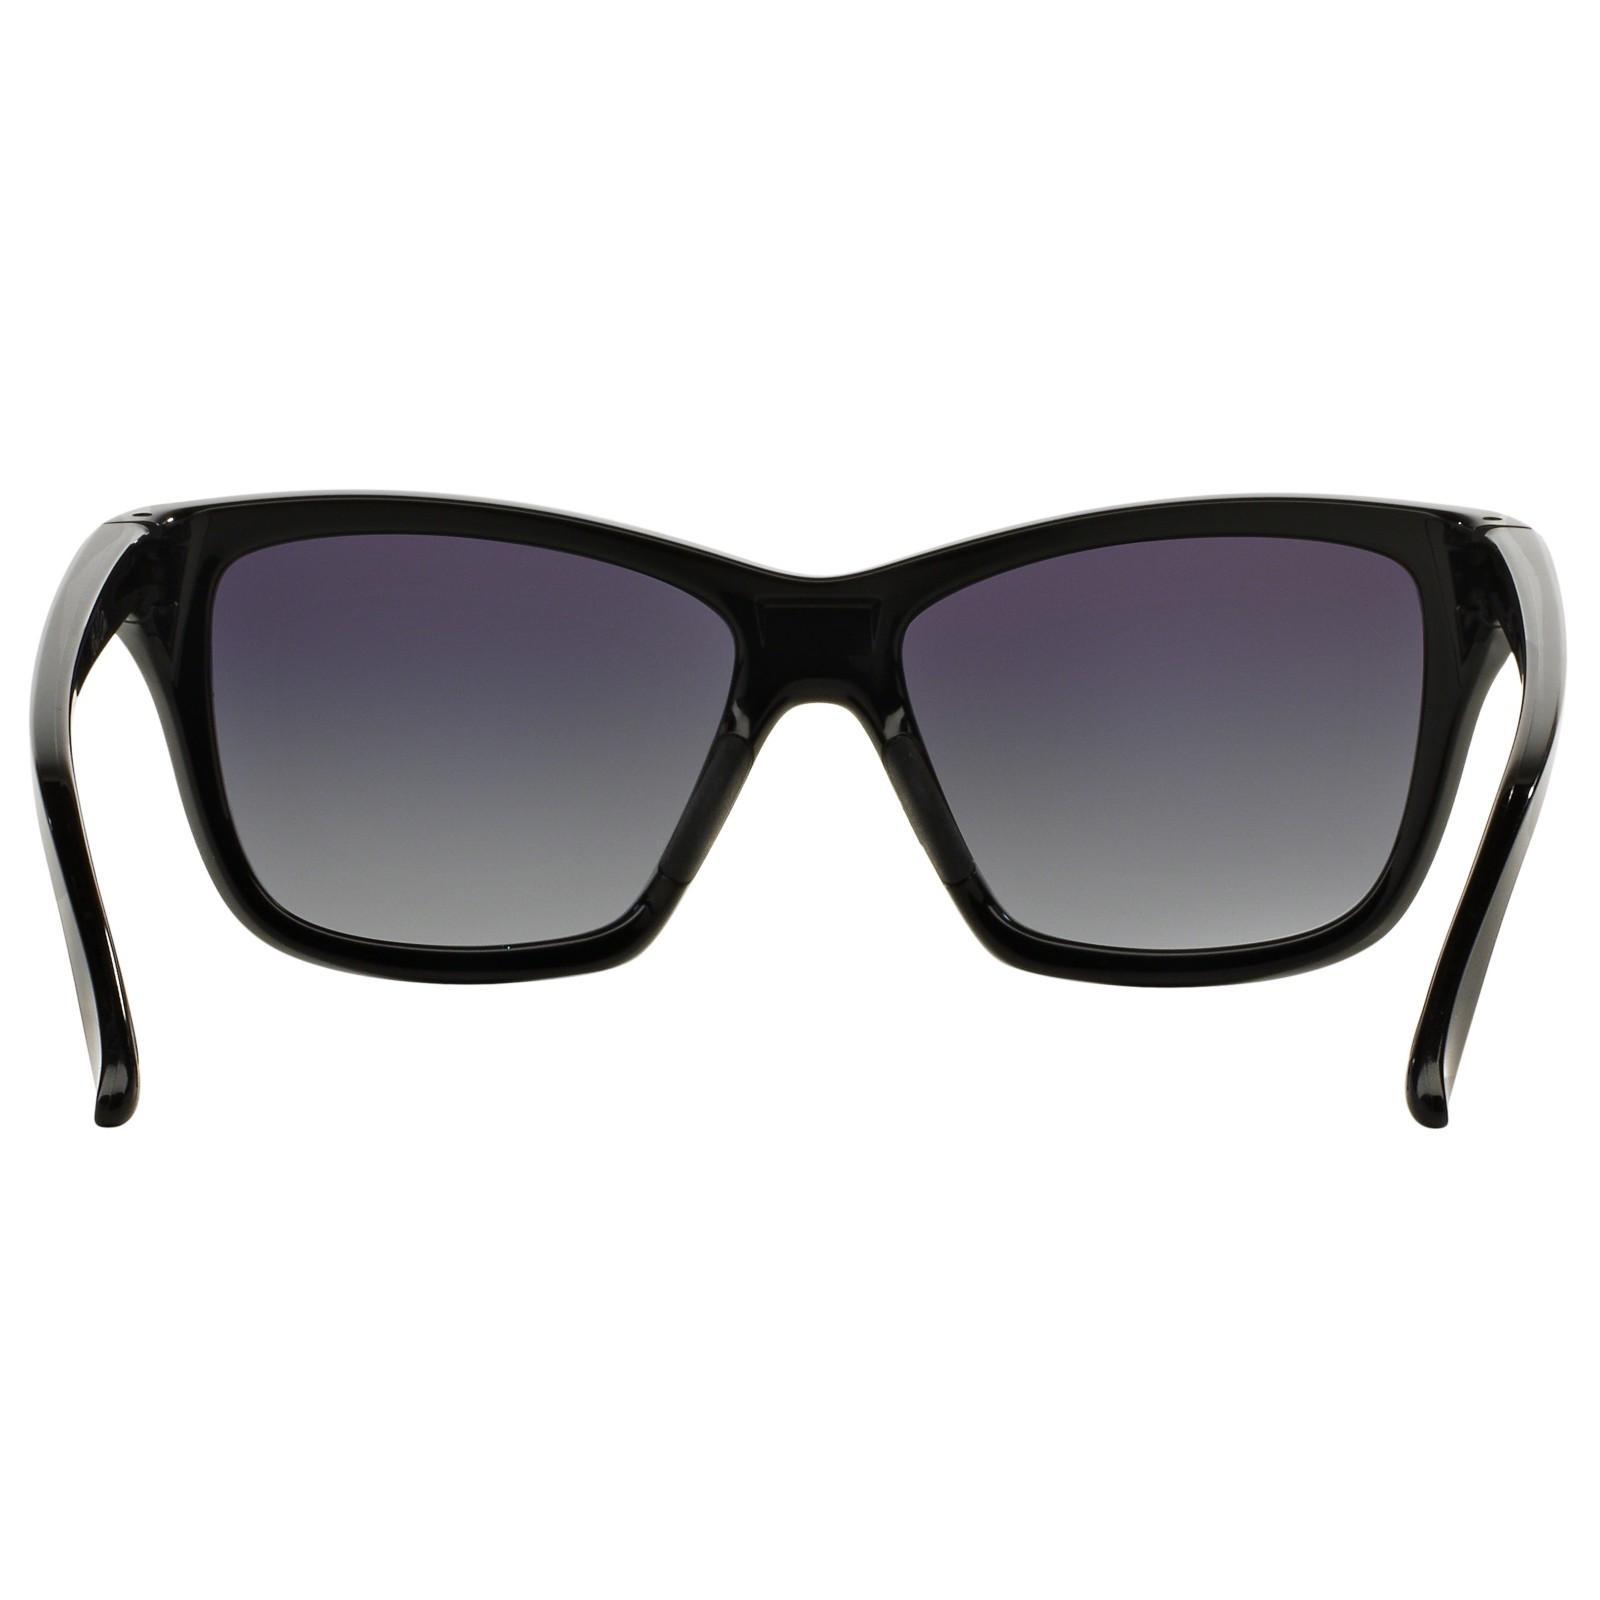 Oakley Oo9298 Polarised Square Sunglasses in Black